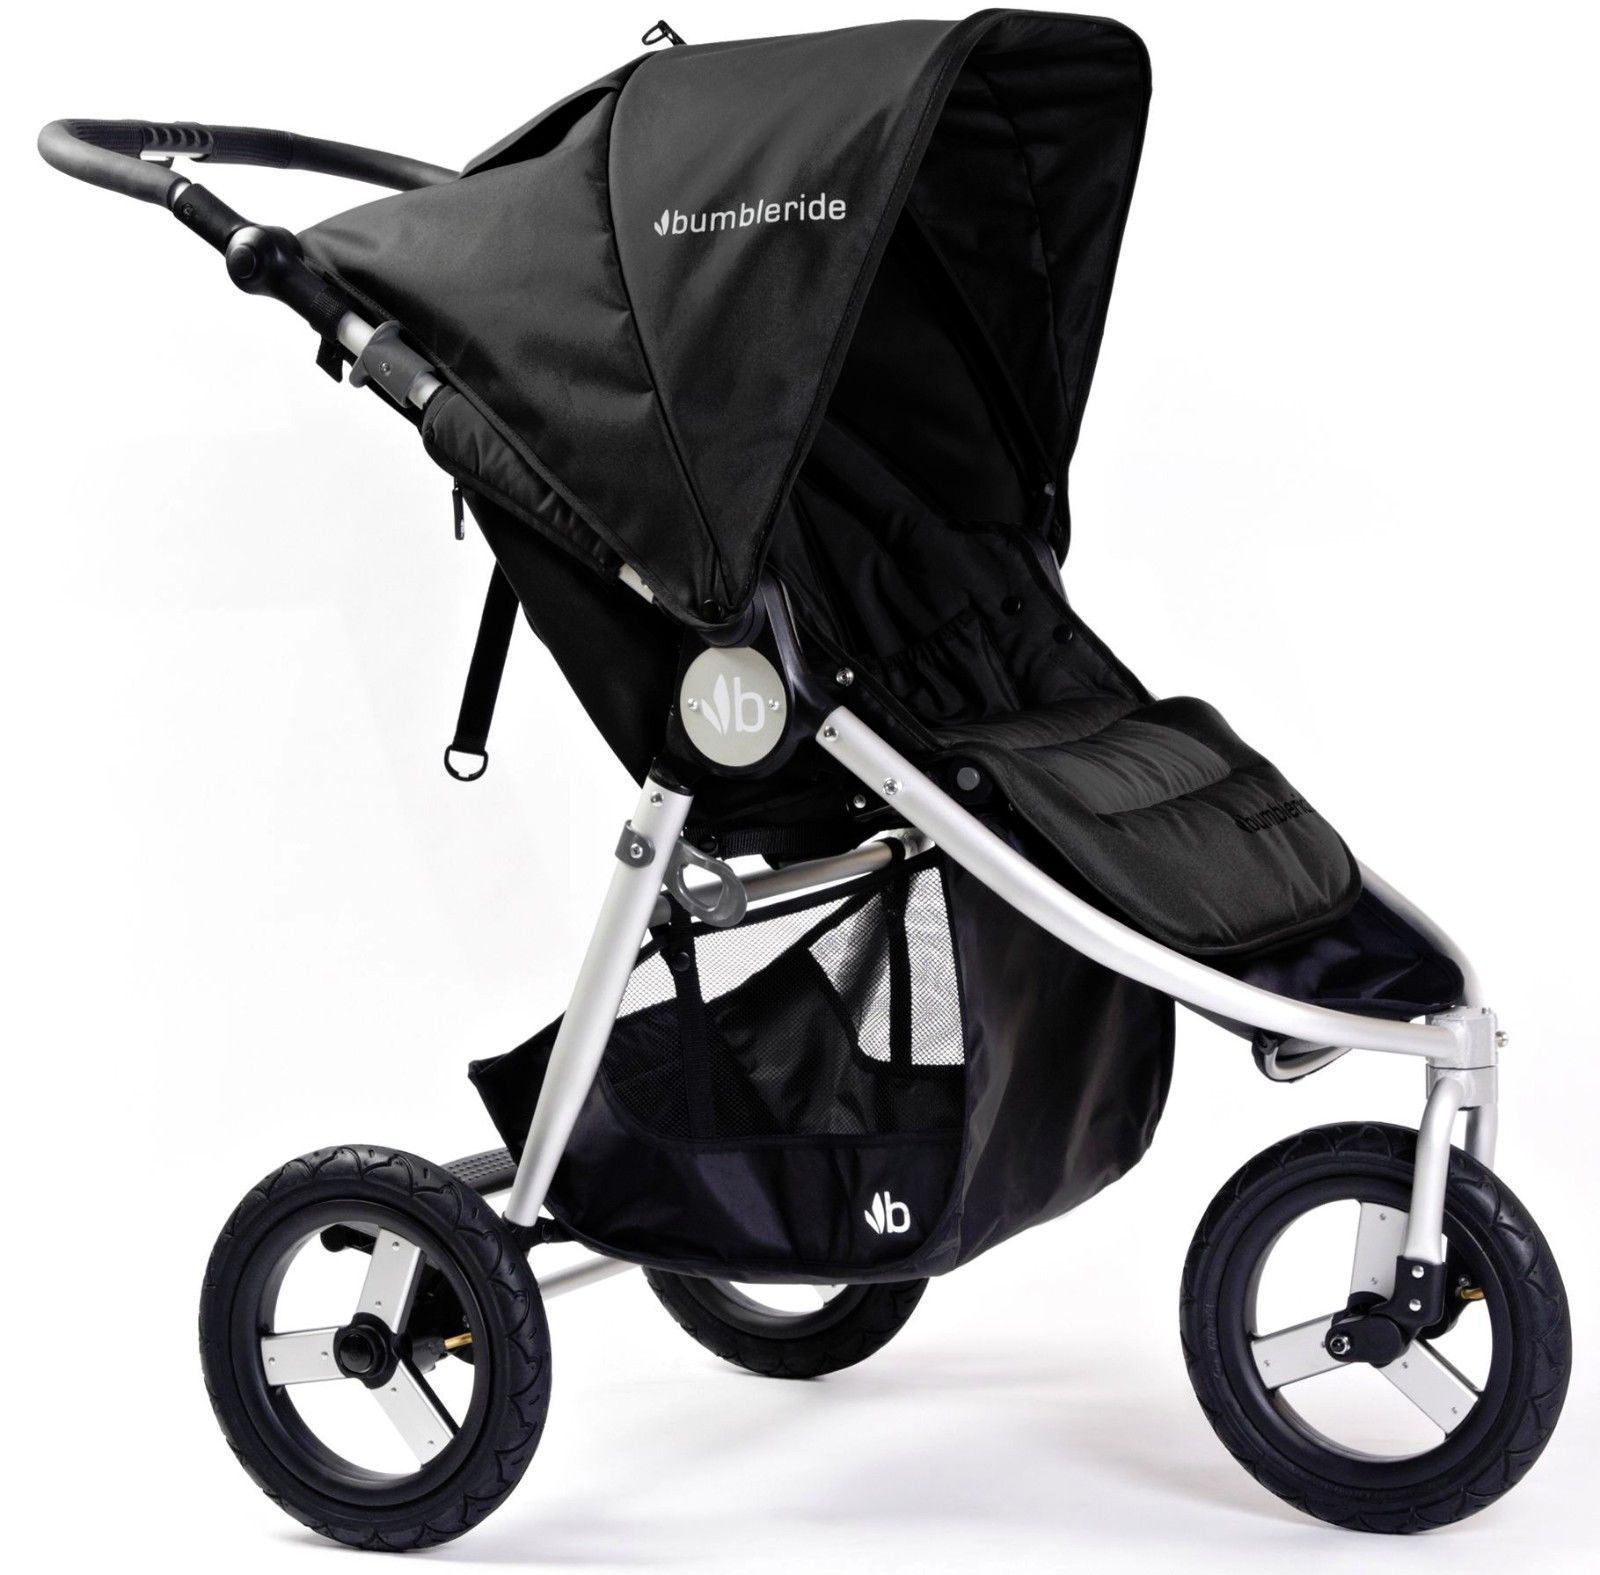 Bumbleride Indie Compact Lightweight All Terrain Stroller